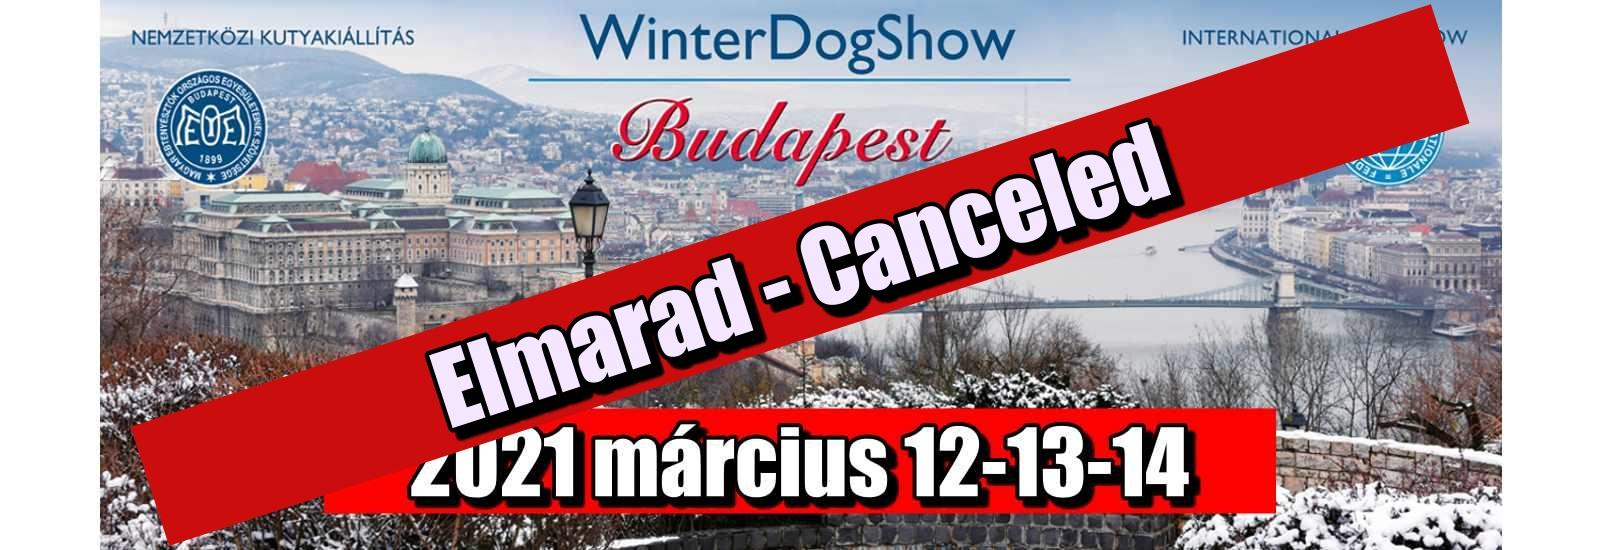 Winterdogshow Canceled